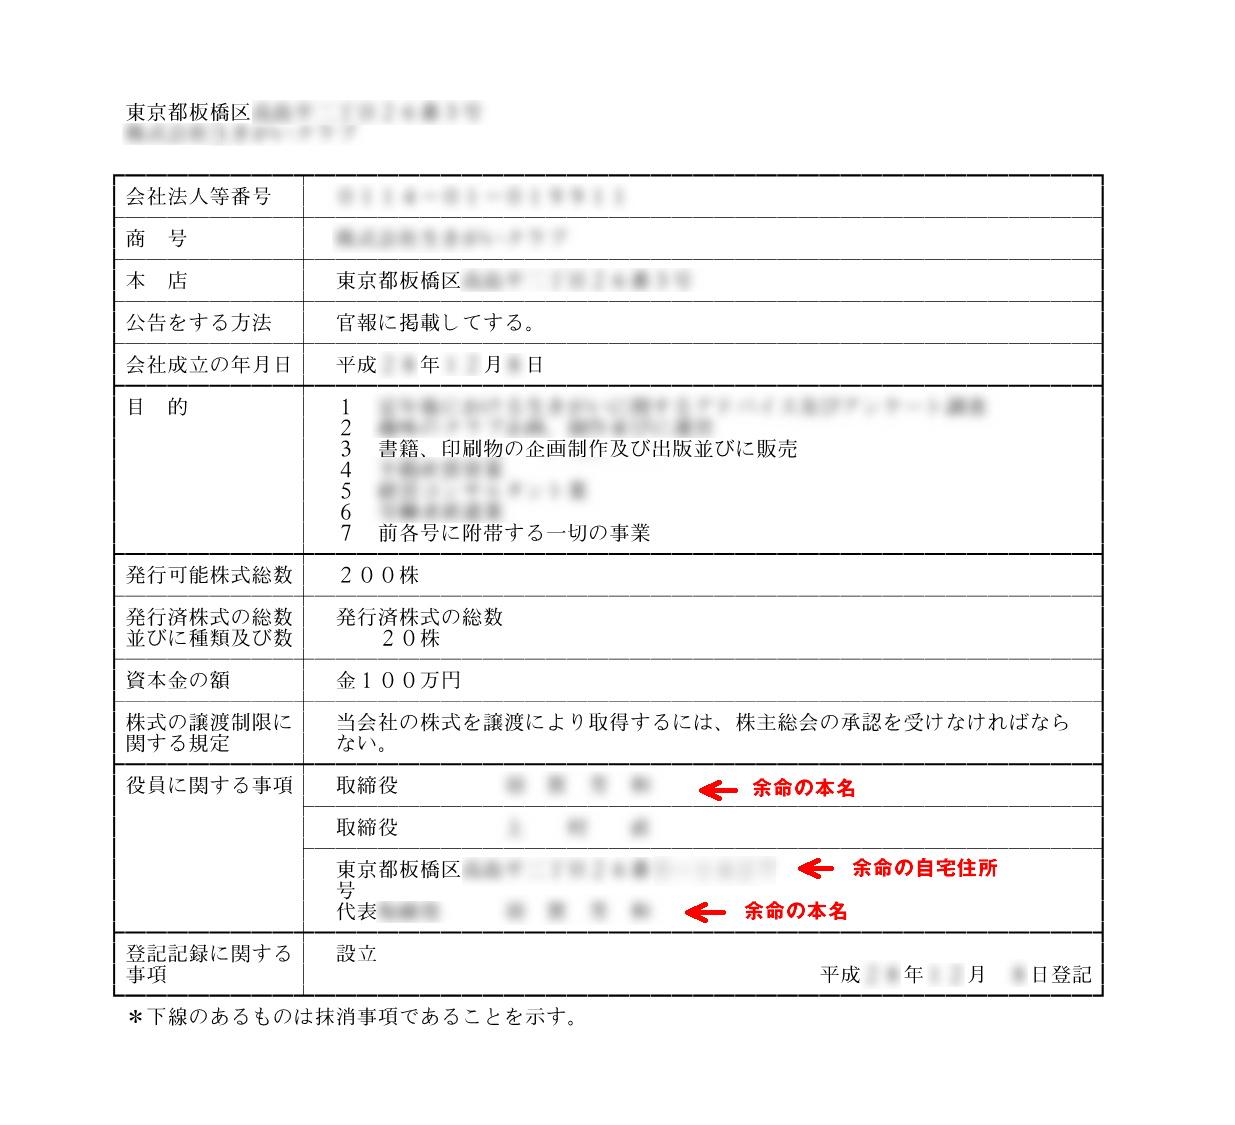 yomei-tohon1.jpg